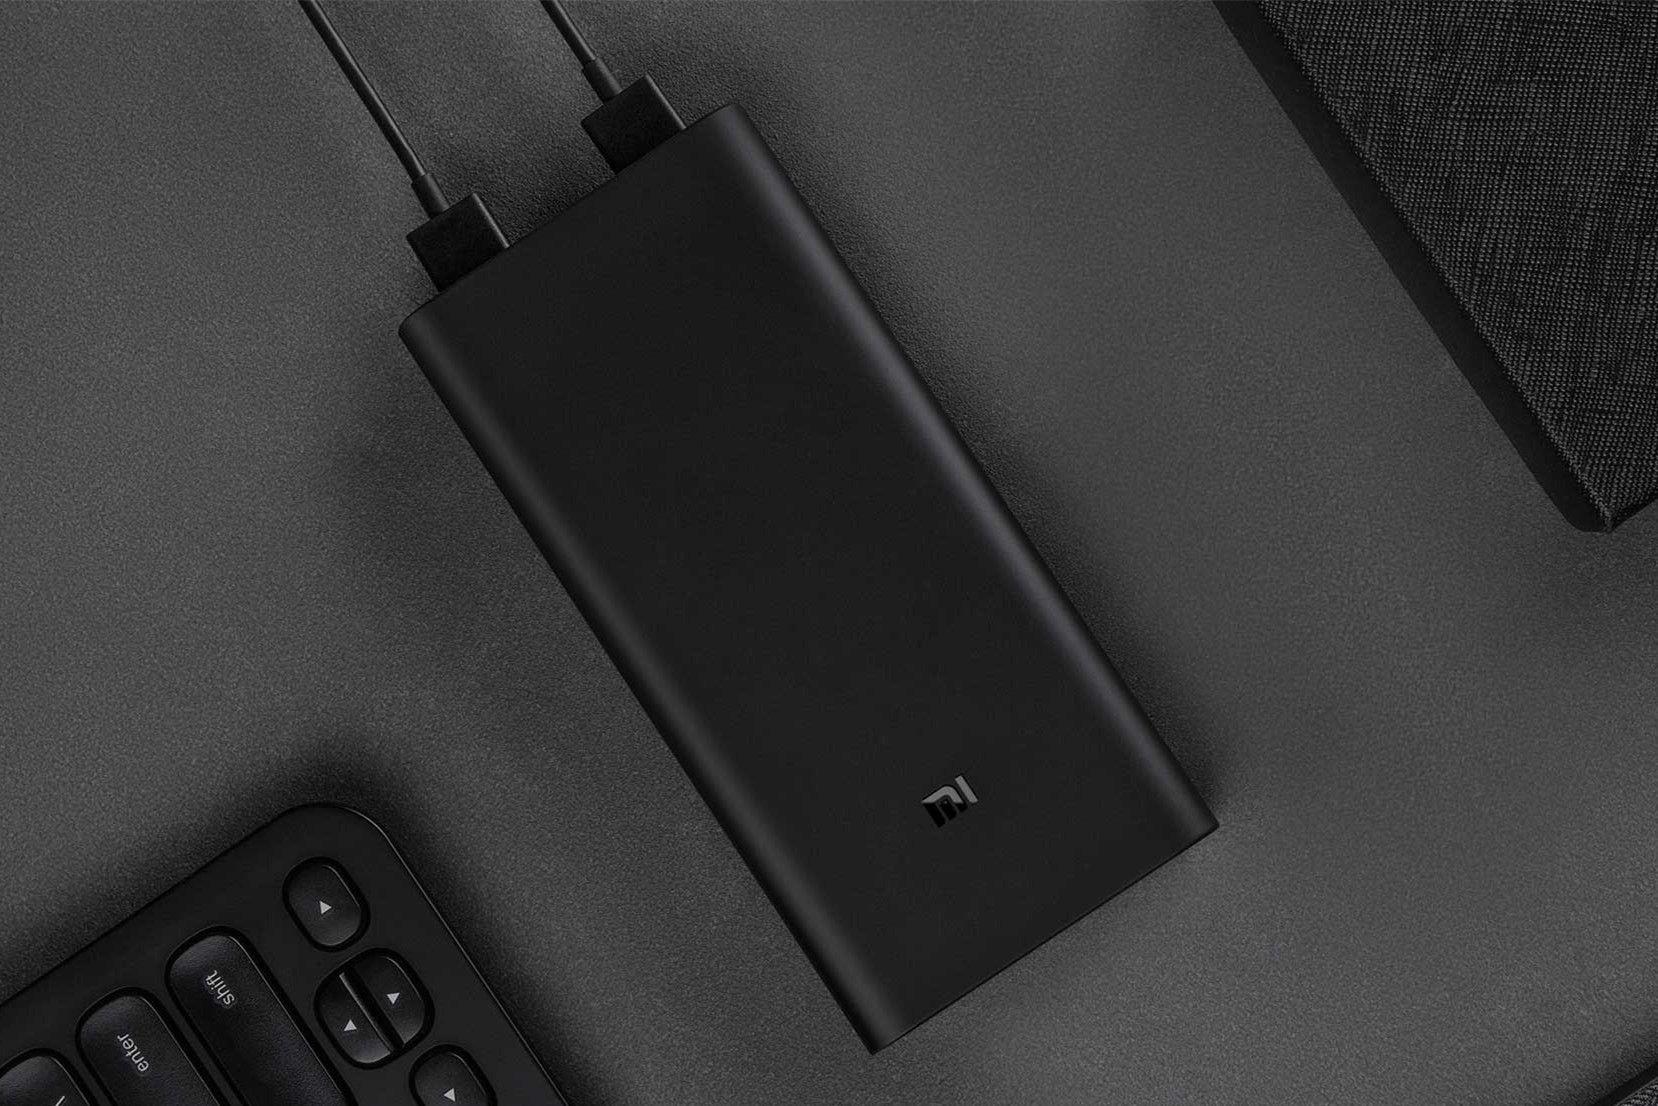 Xiaomi Power Bank 3 Pro 20000mah Usb C Qc 3 0 Fast Charge Power Bank (8)